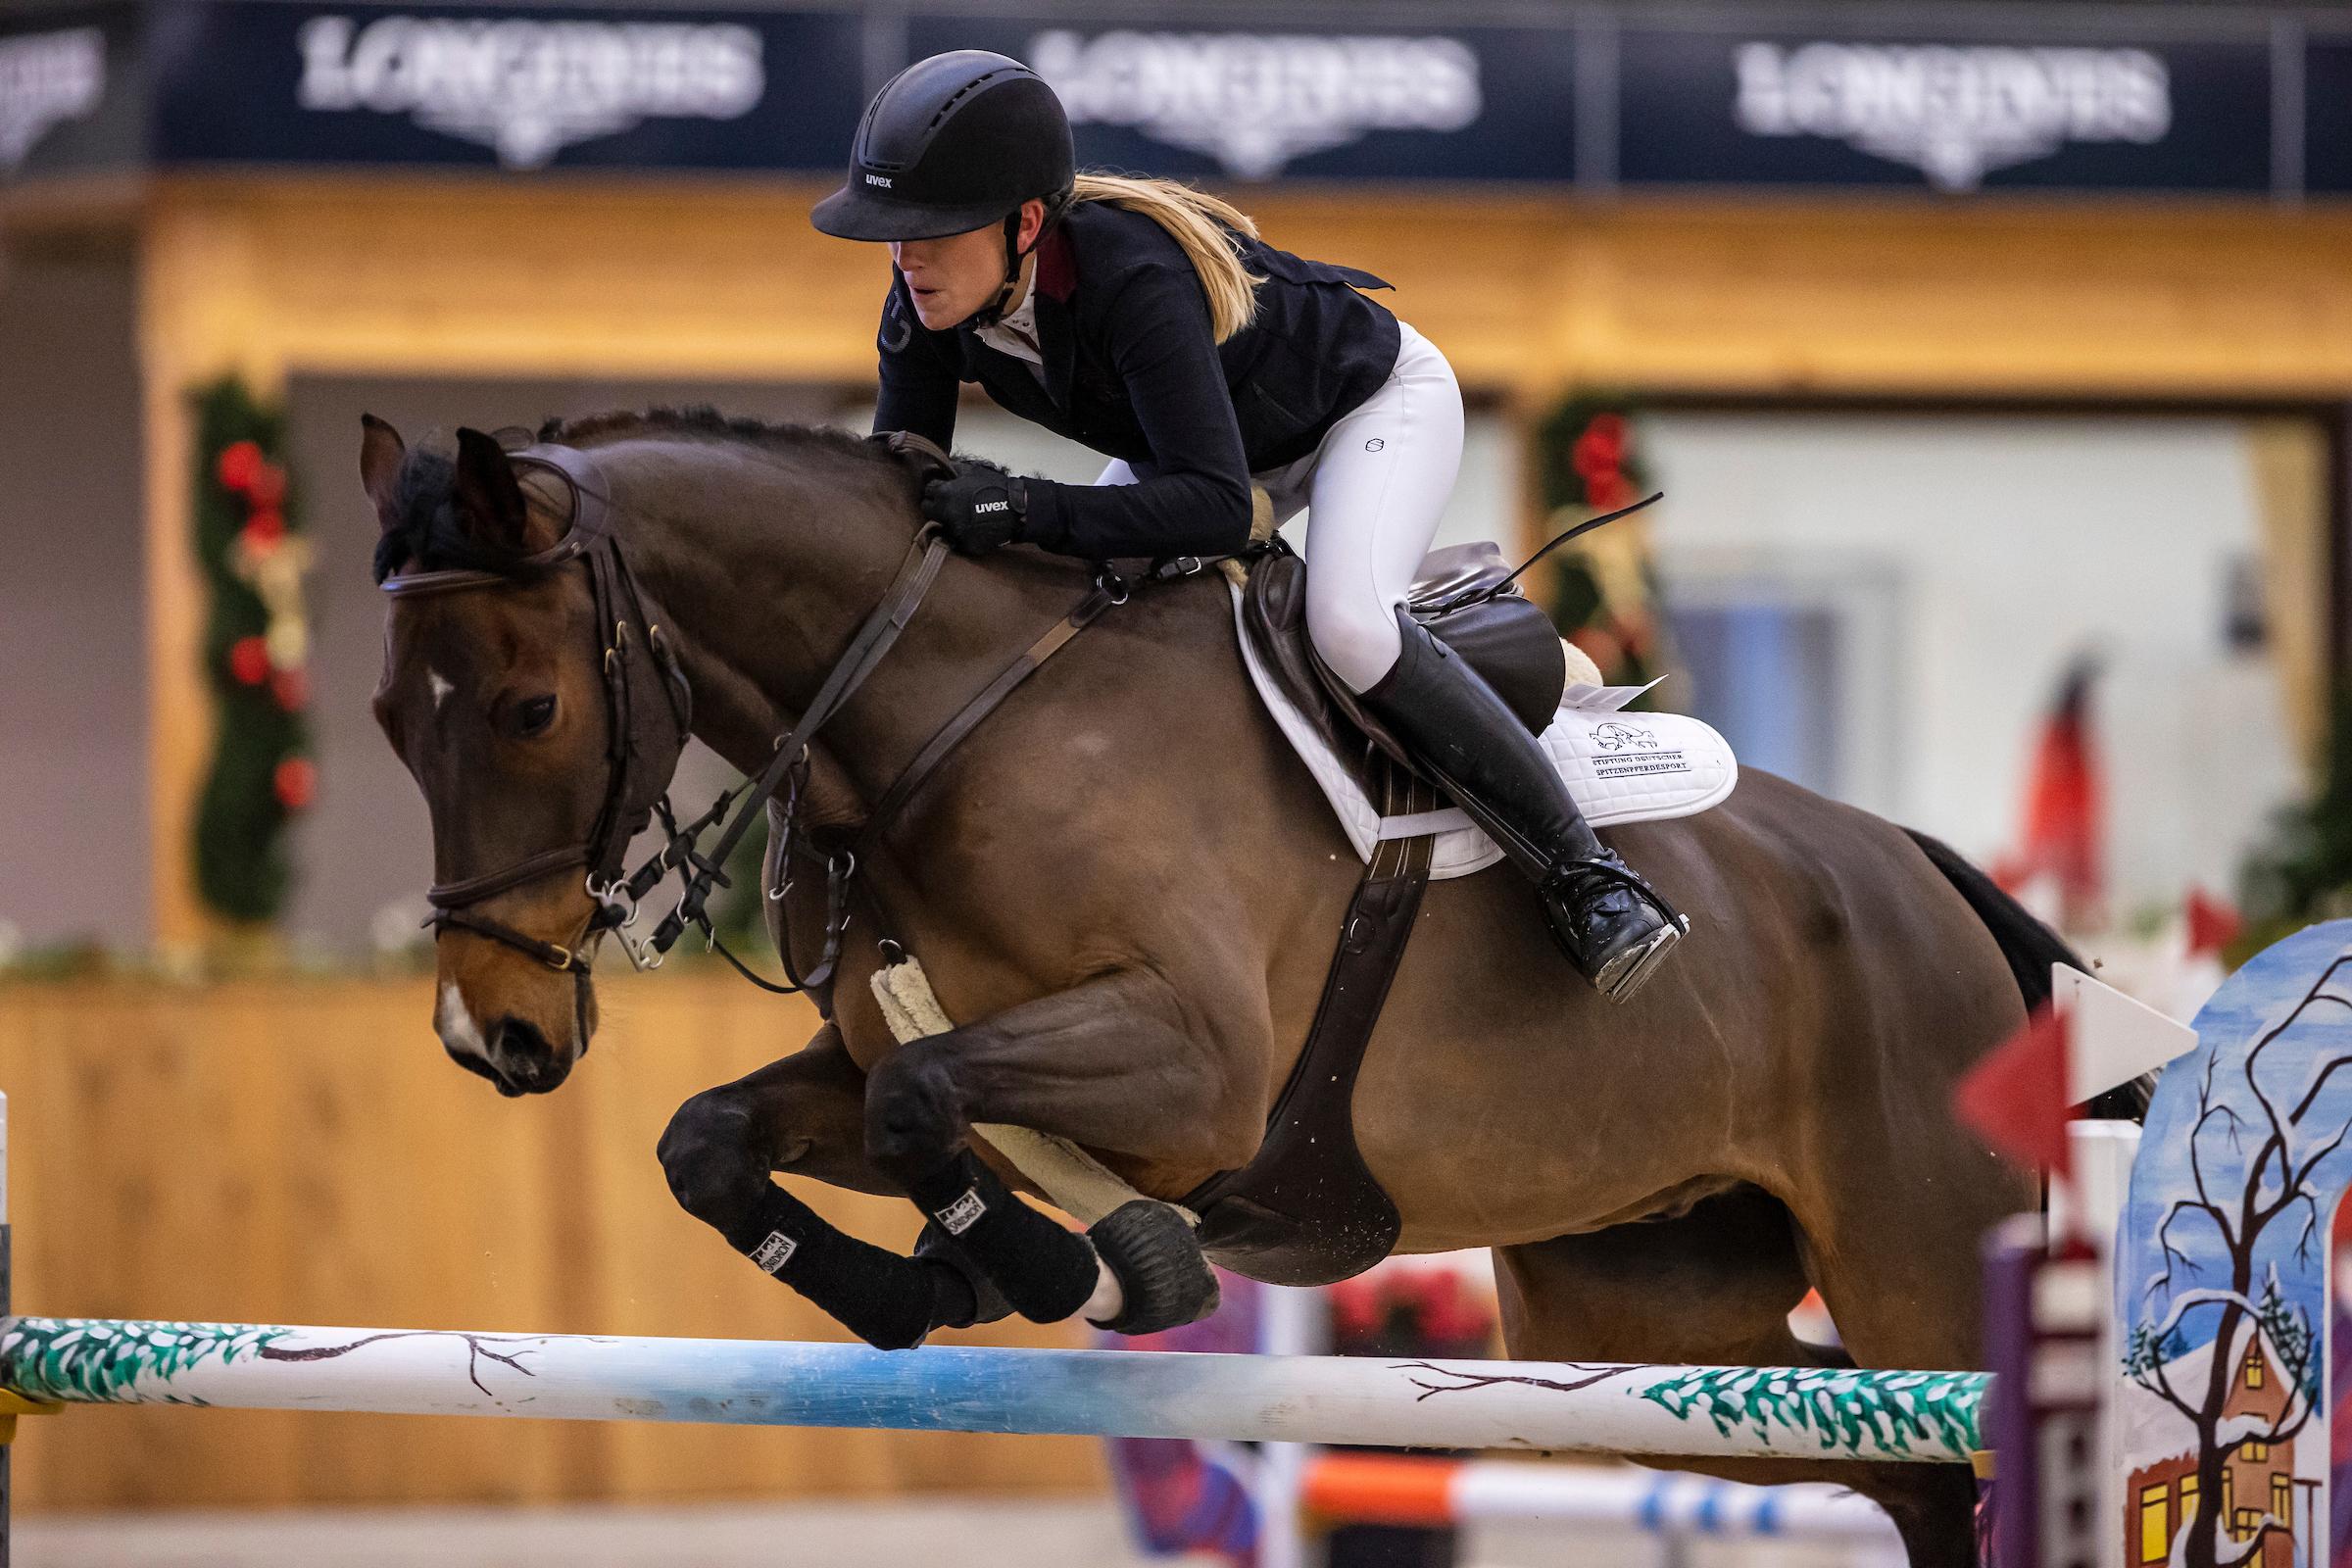 Riesenbeck: Finja Bormann auch U25-Champion